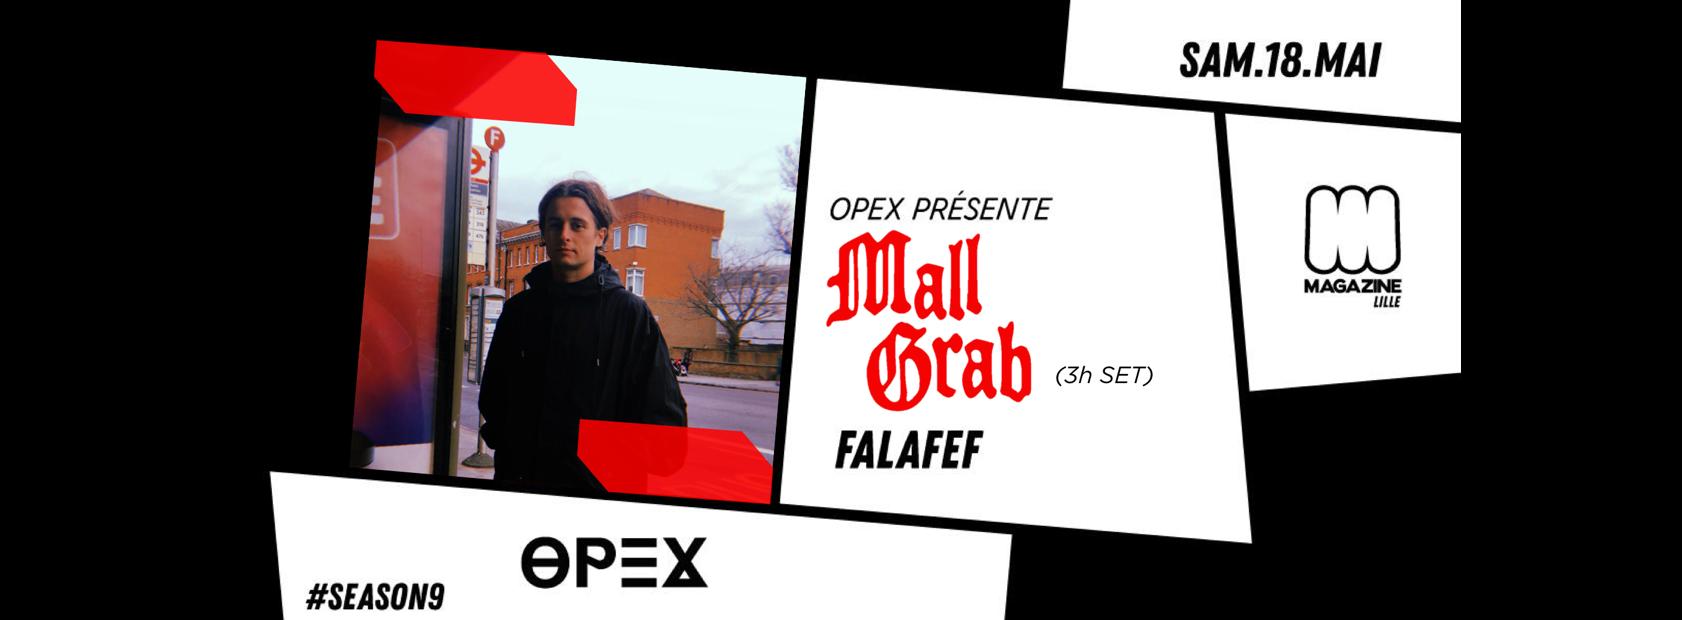 OPEX présente Mall Grab